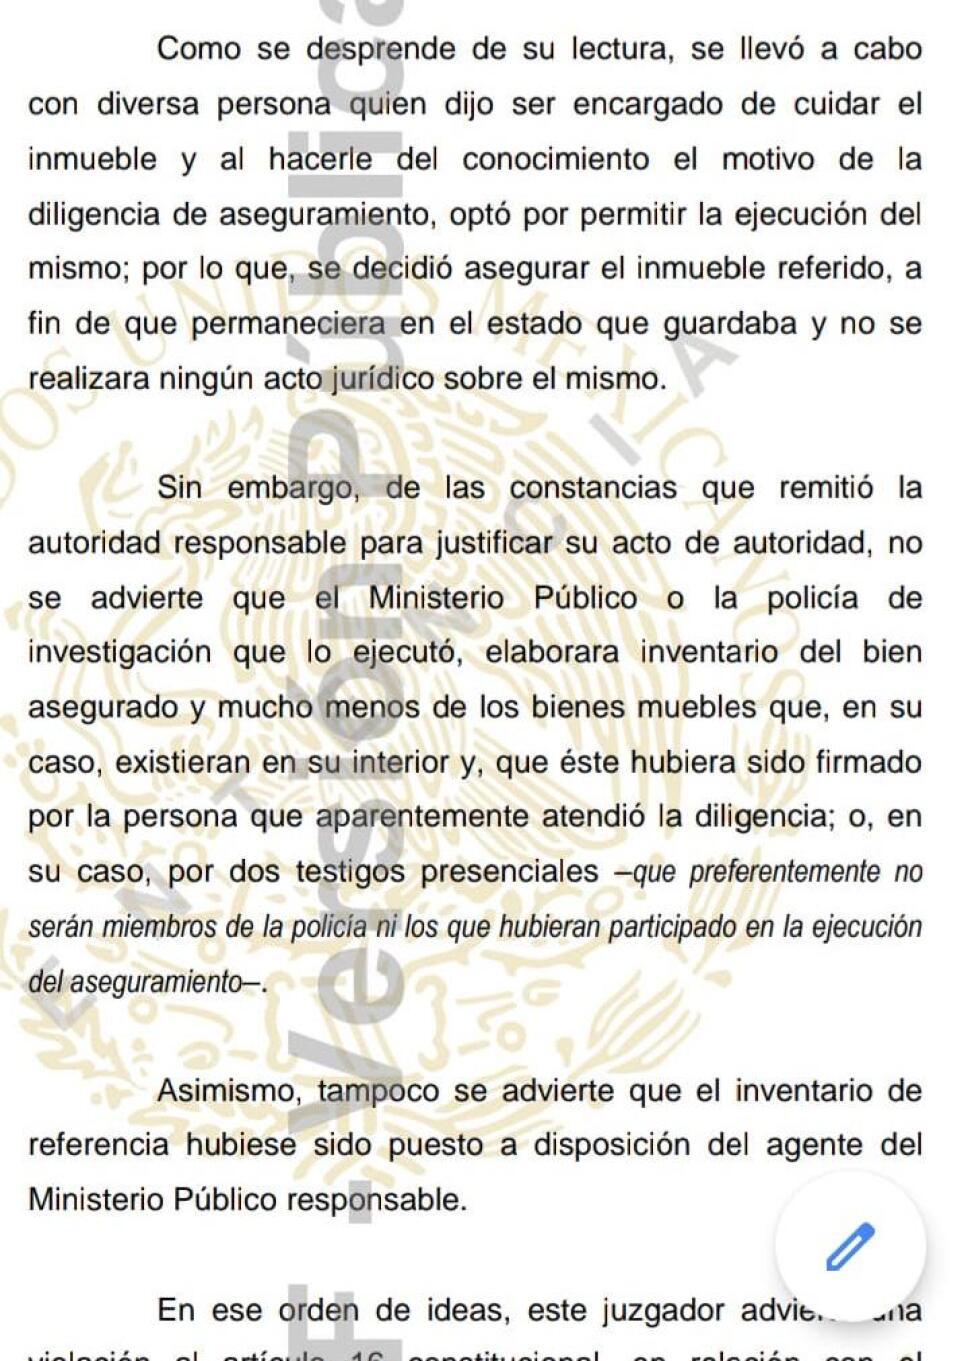 doc lozoya zihuatanejo 2.jpg